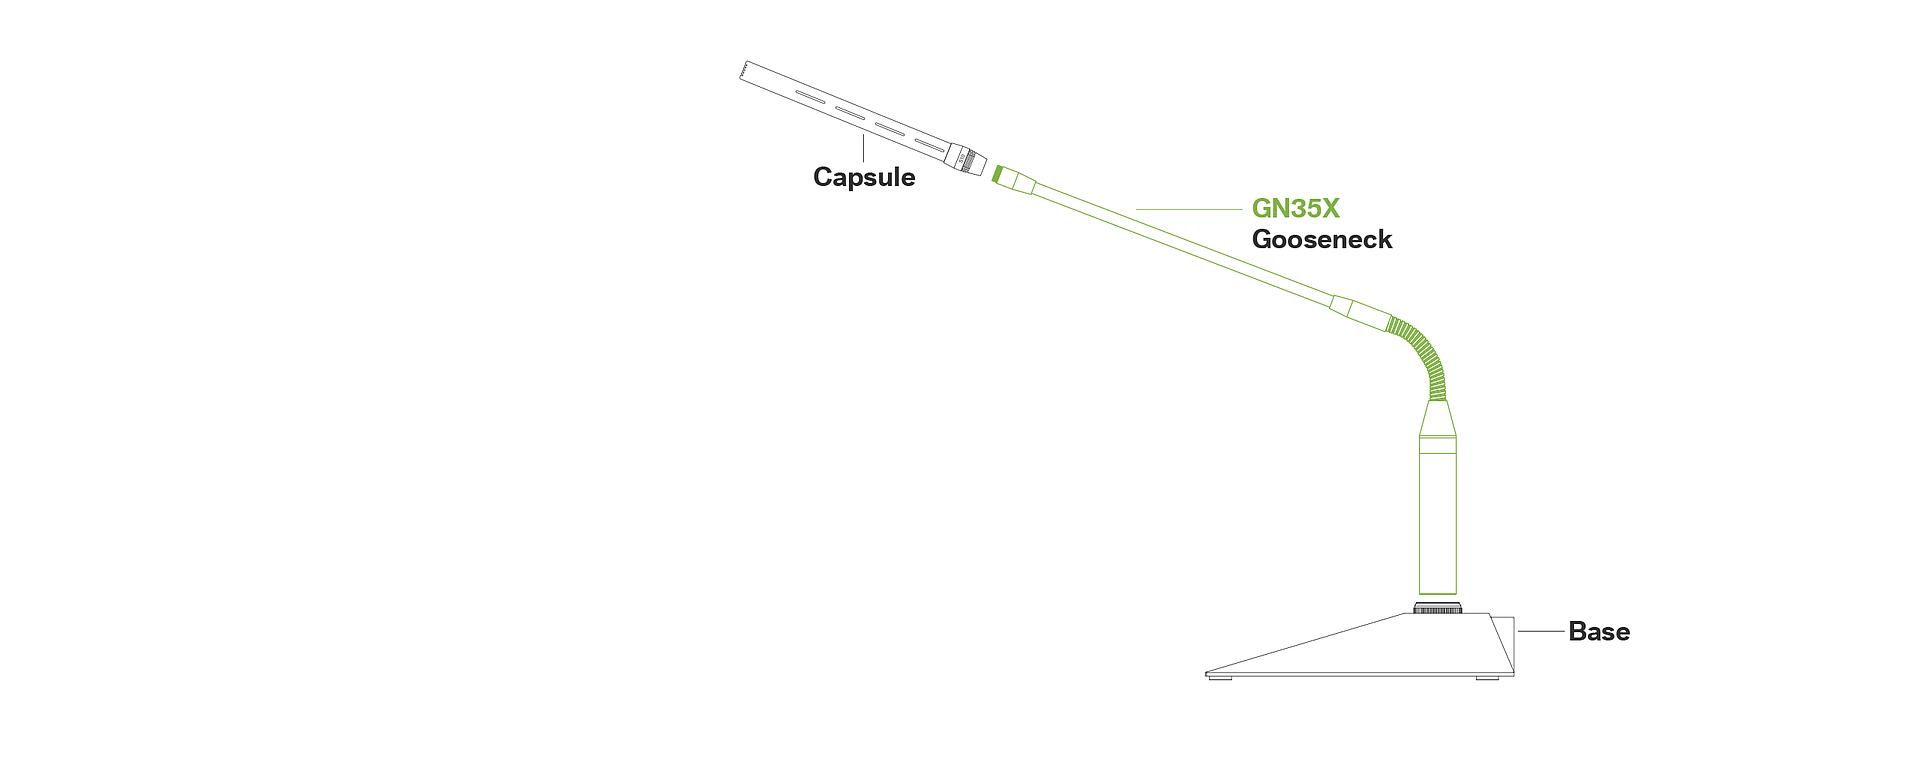 Conference series GN35X gooseneck LEWITT